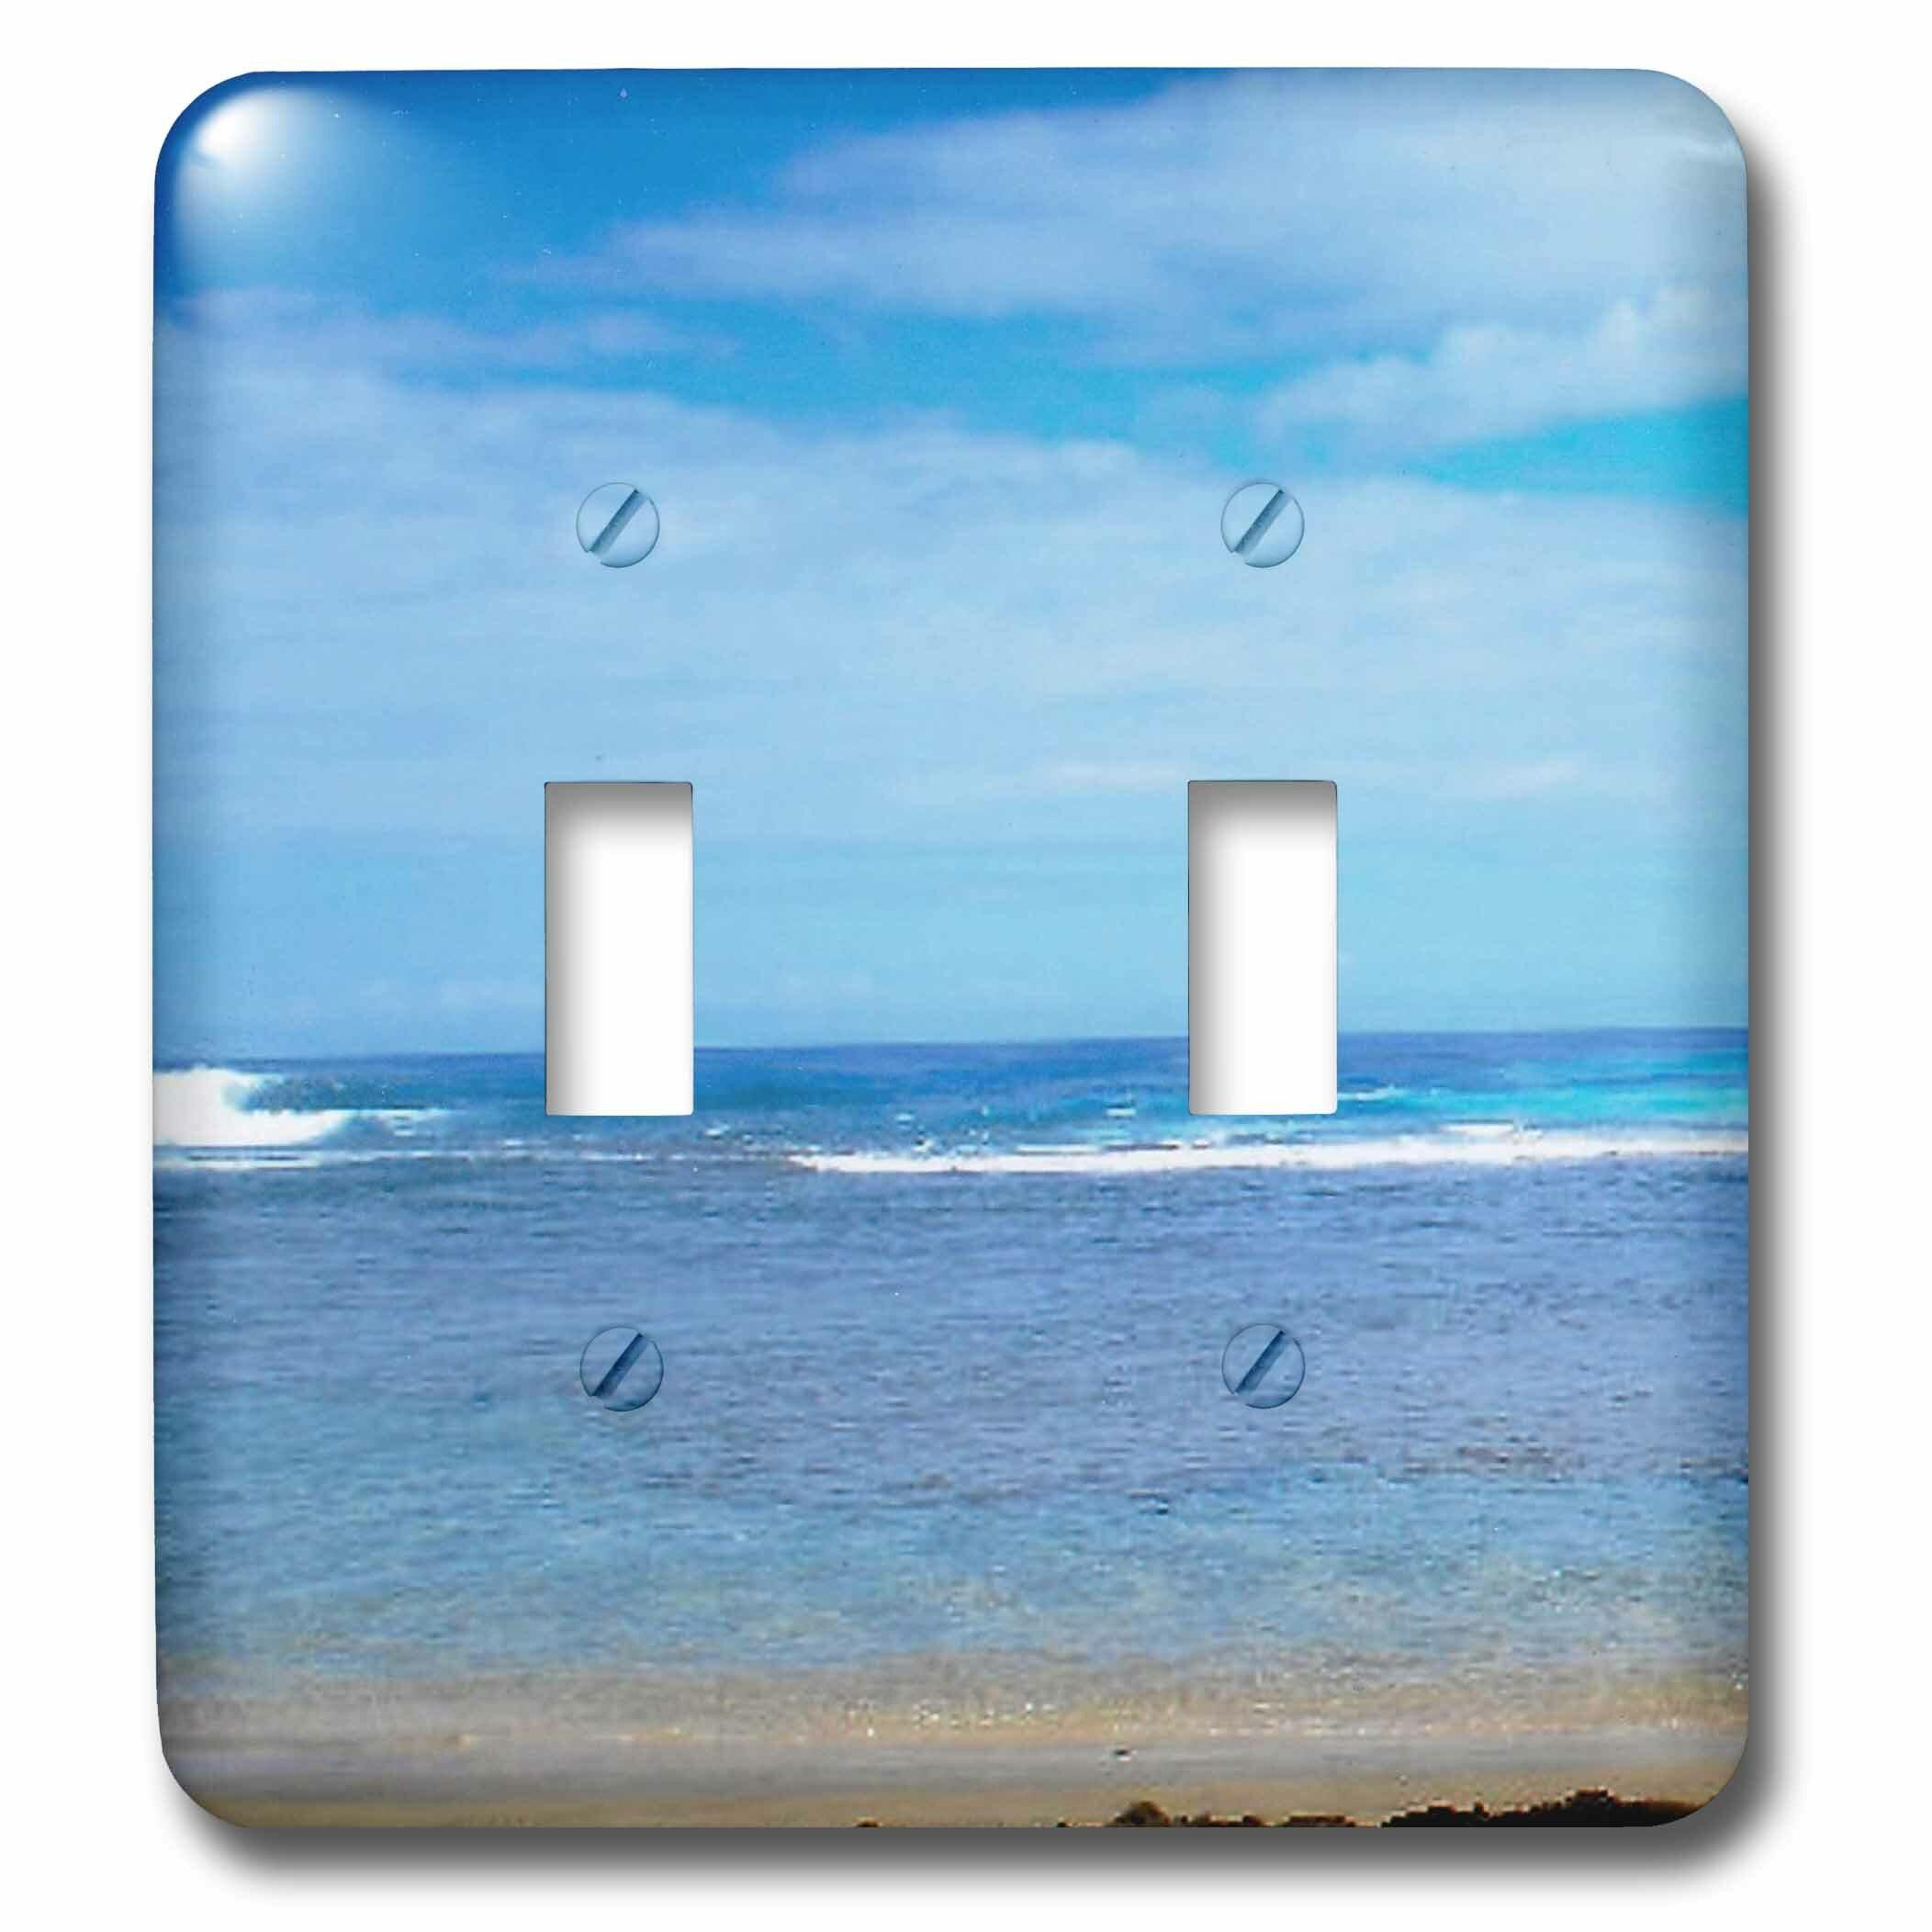 3drose Kauai Coastline Hanalei Bay 2 Gang Toggle Light Switch Wall Plate Wayfair